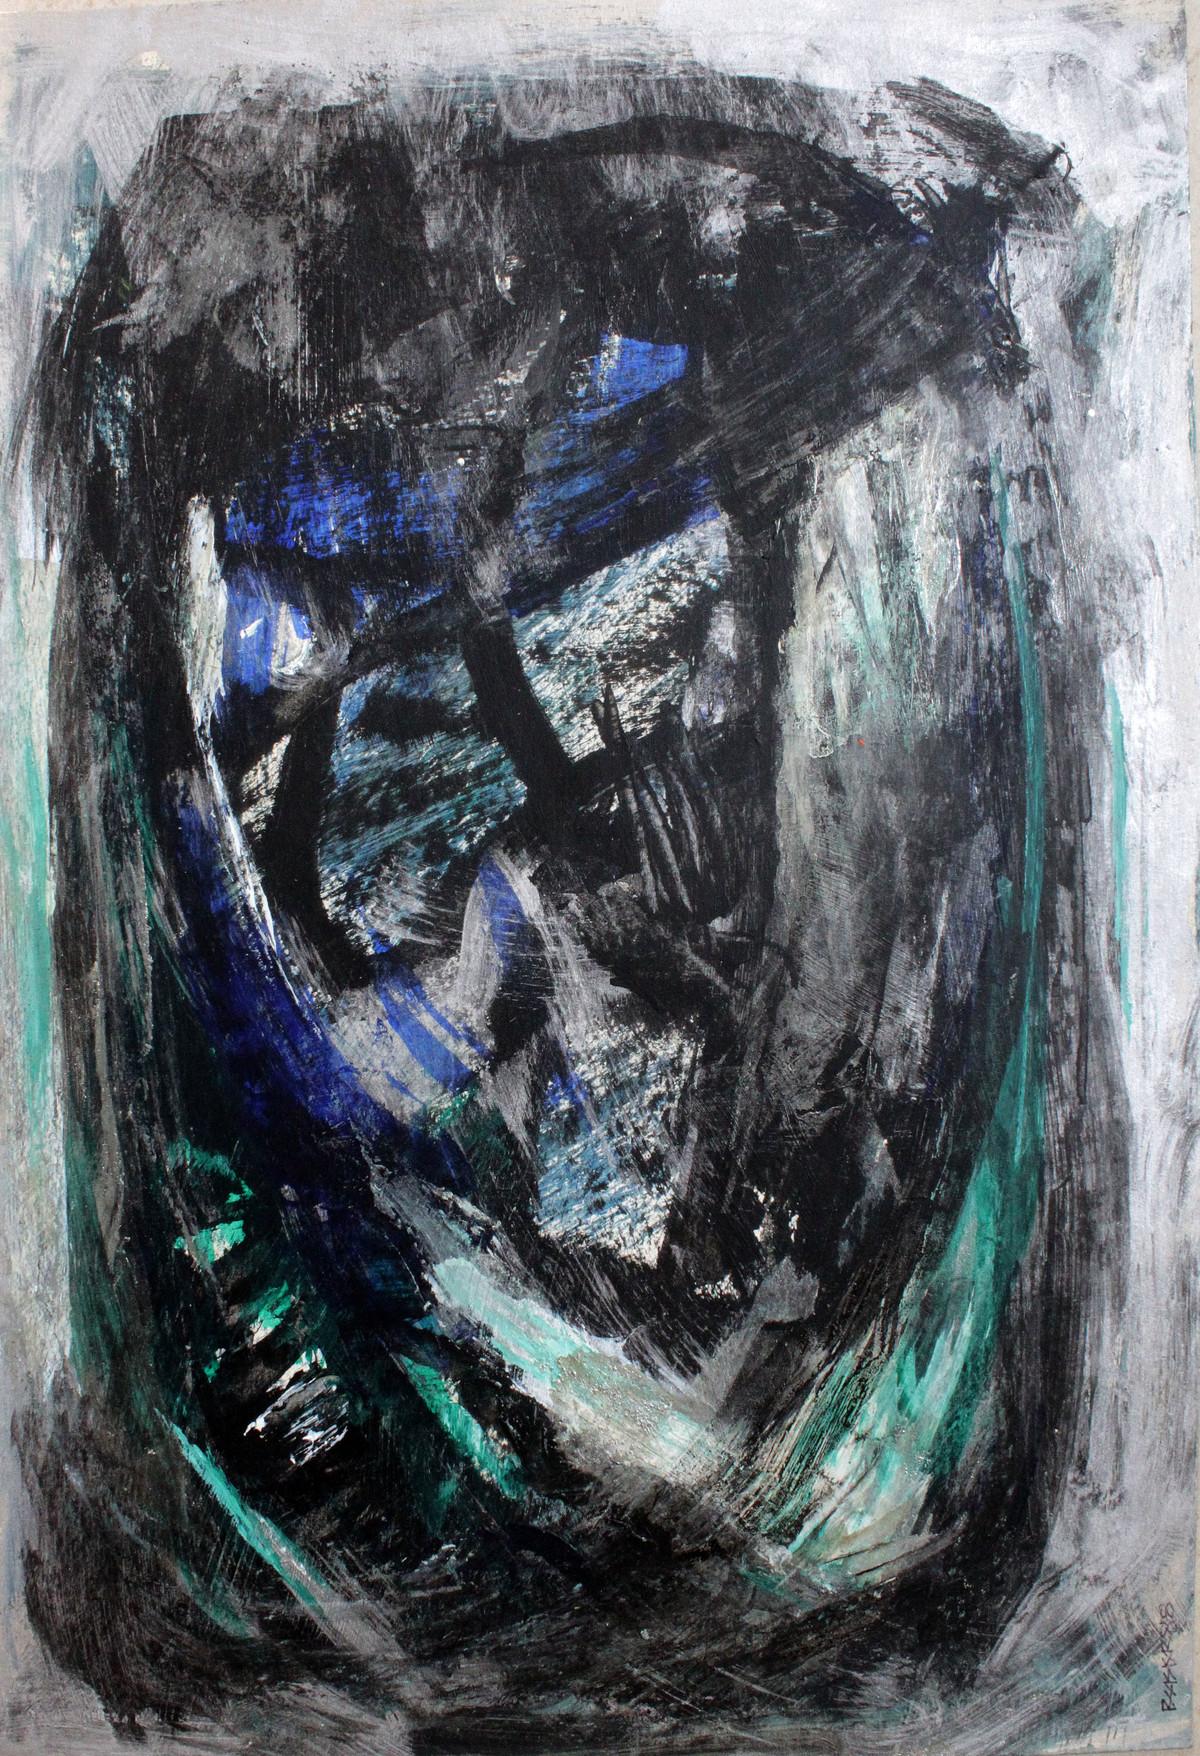 Paper 13 Digital Print by Bhaskar Hande,Abstract